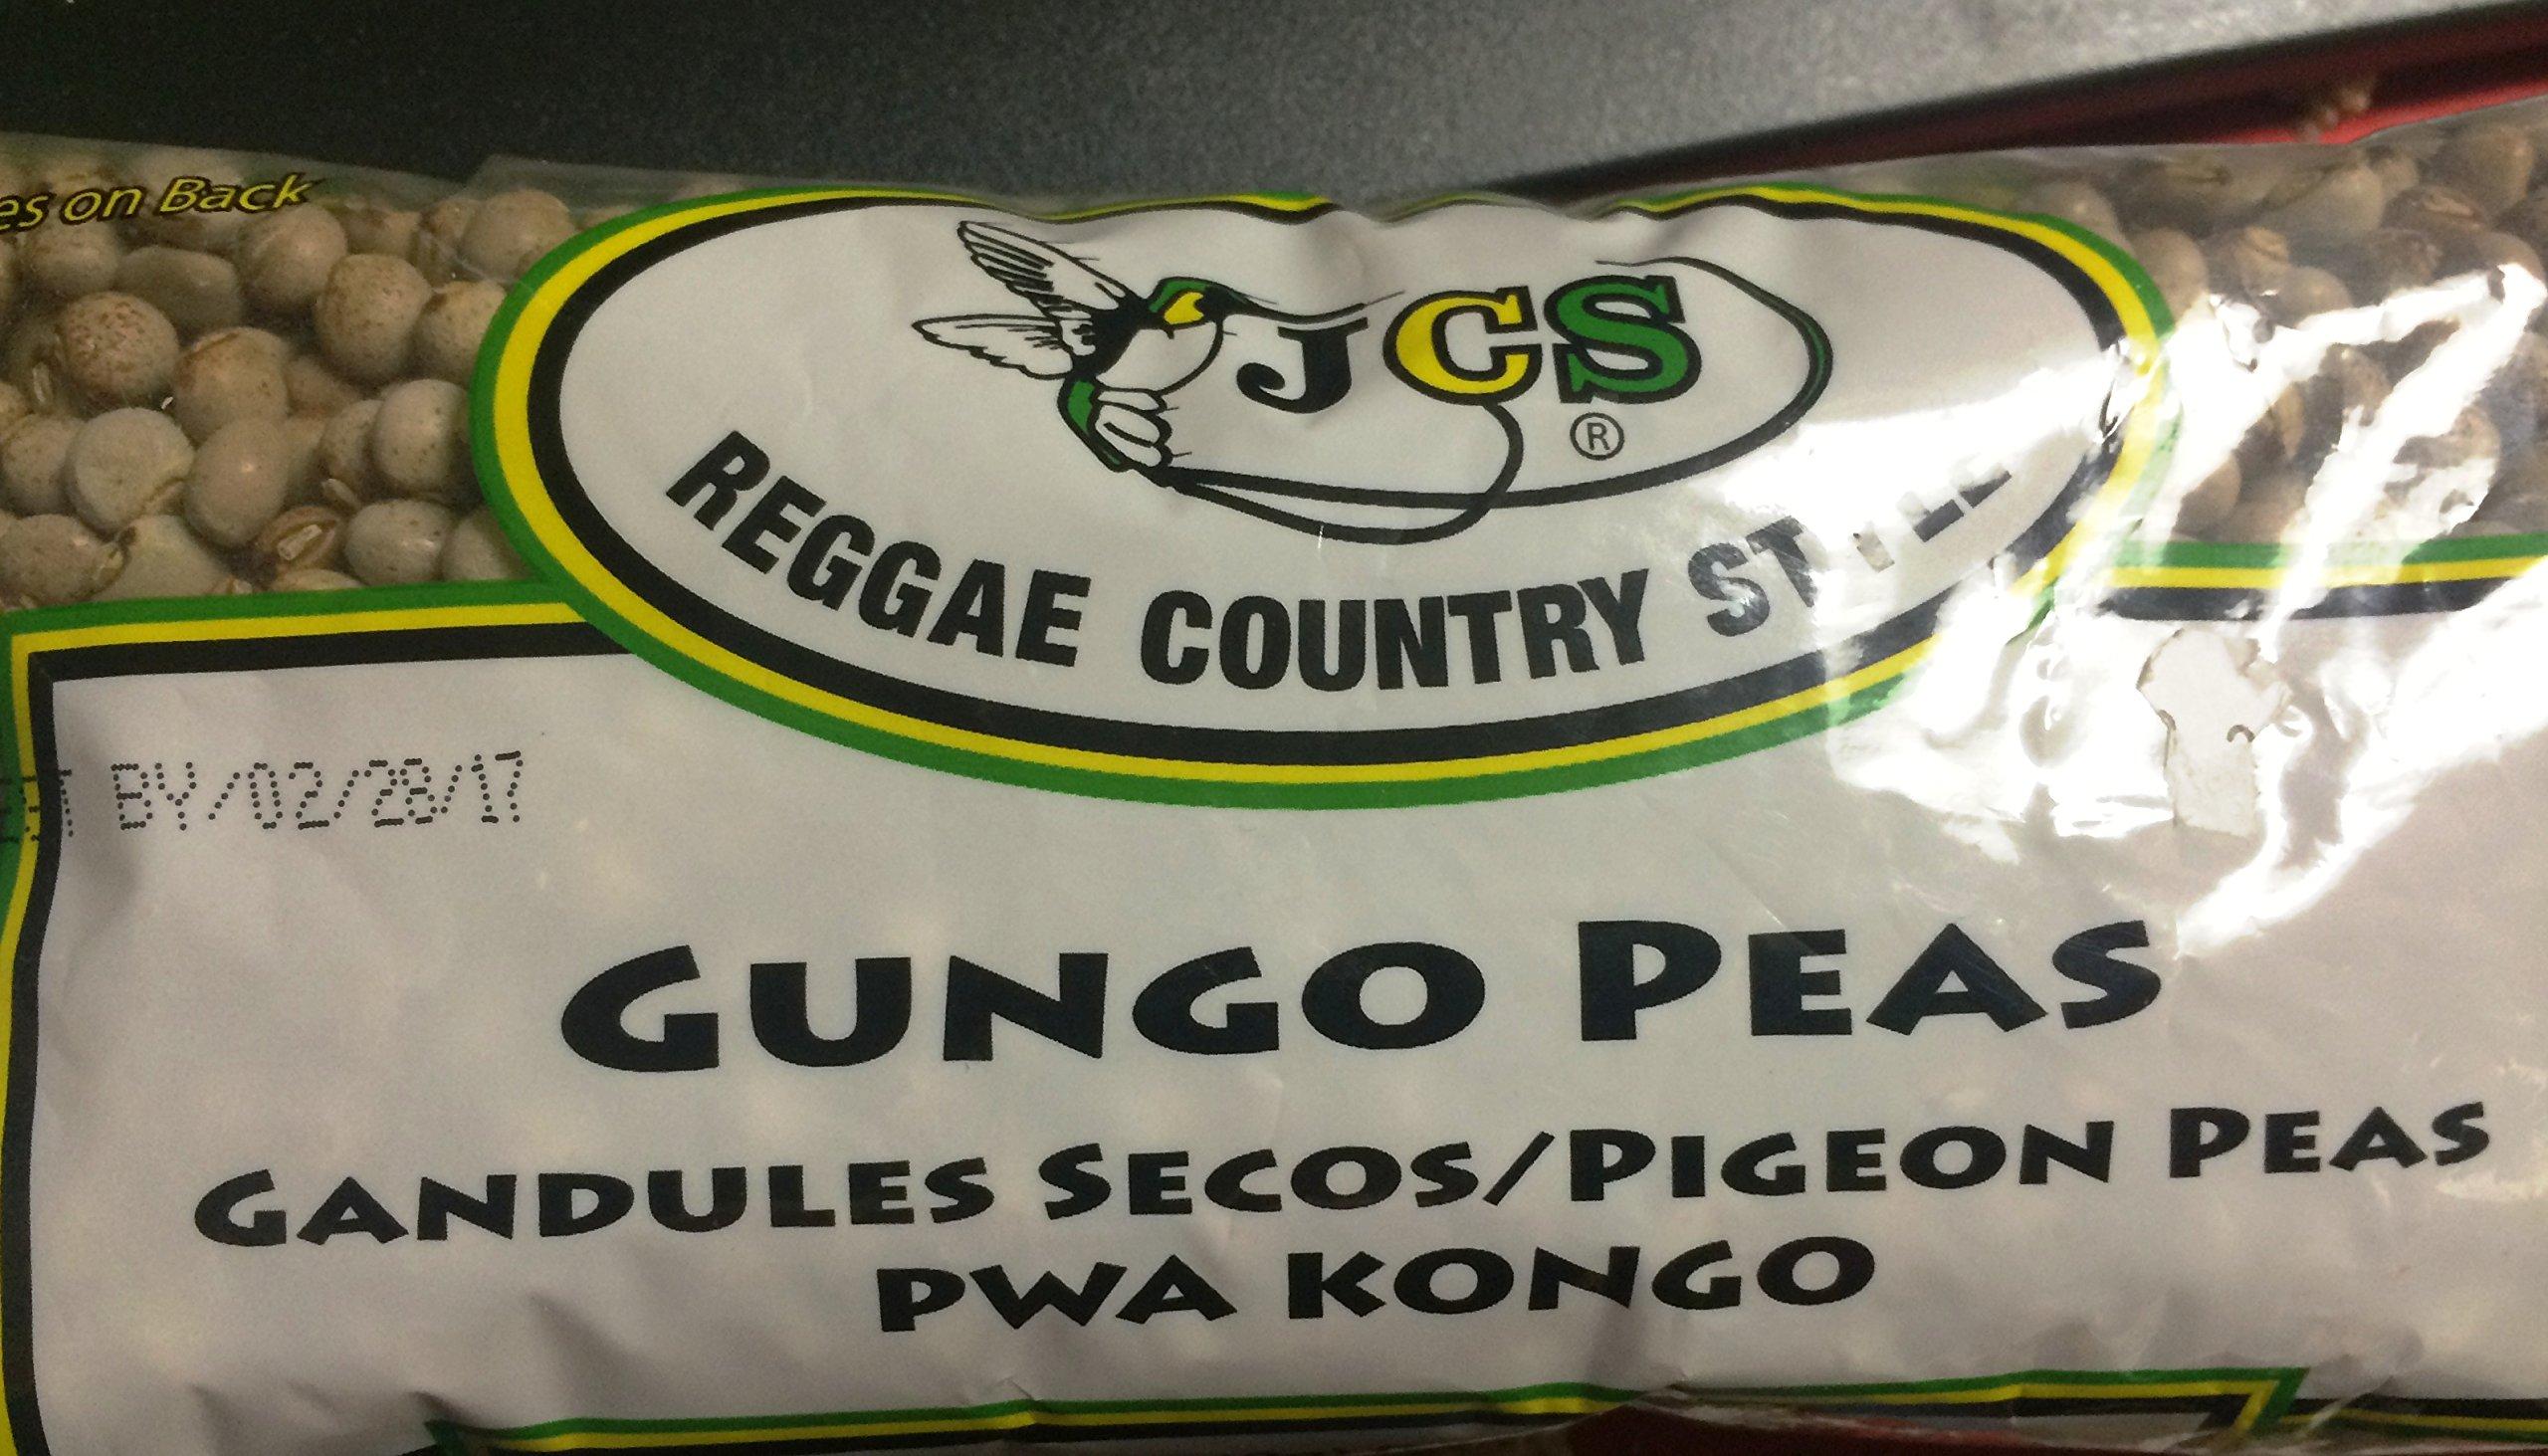 JCS Gungo Peas (Pigeon Peas)